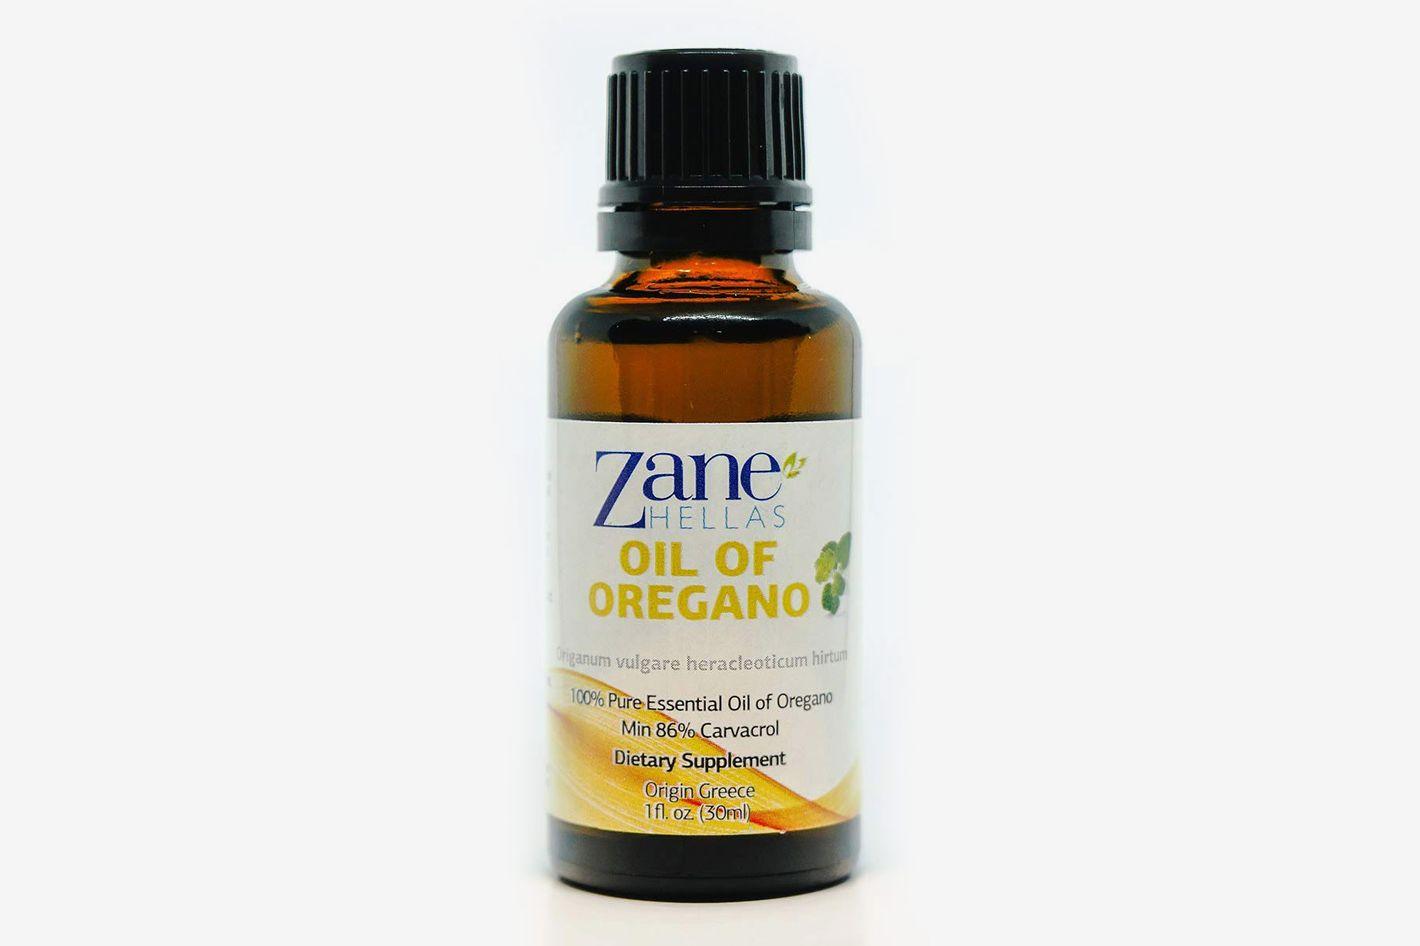 Zane Hellas Pure Greek Essential Oil of Oregano With 86 Percent Minimum Carvacrol